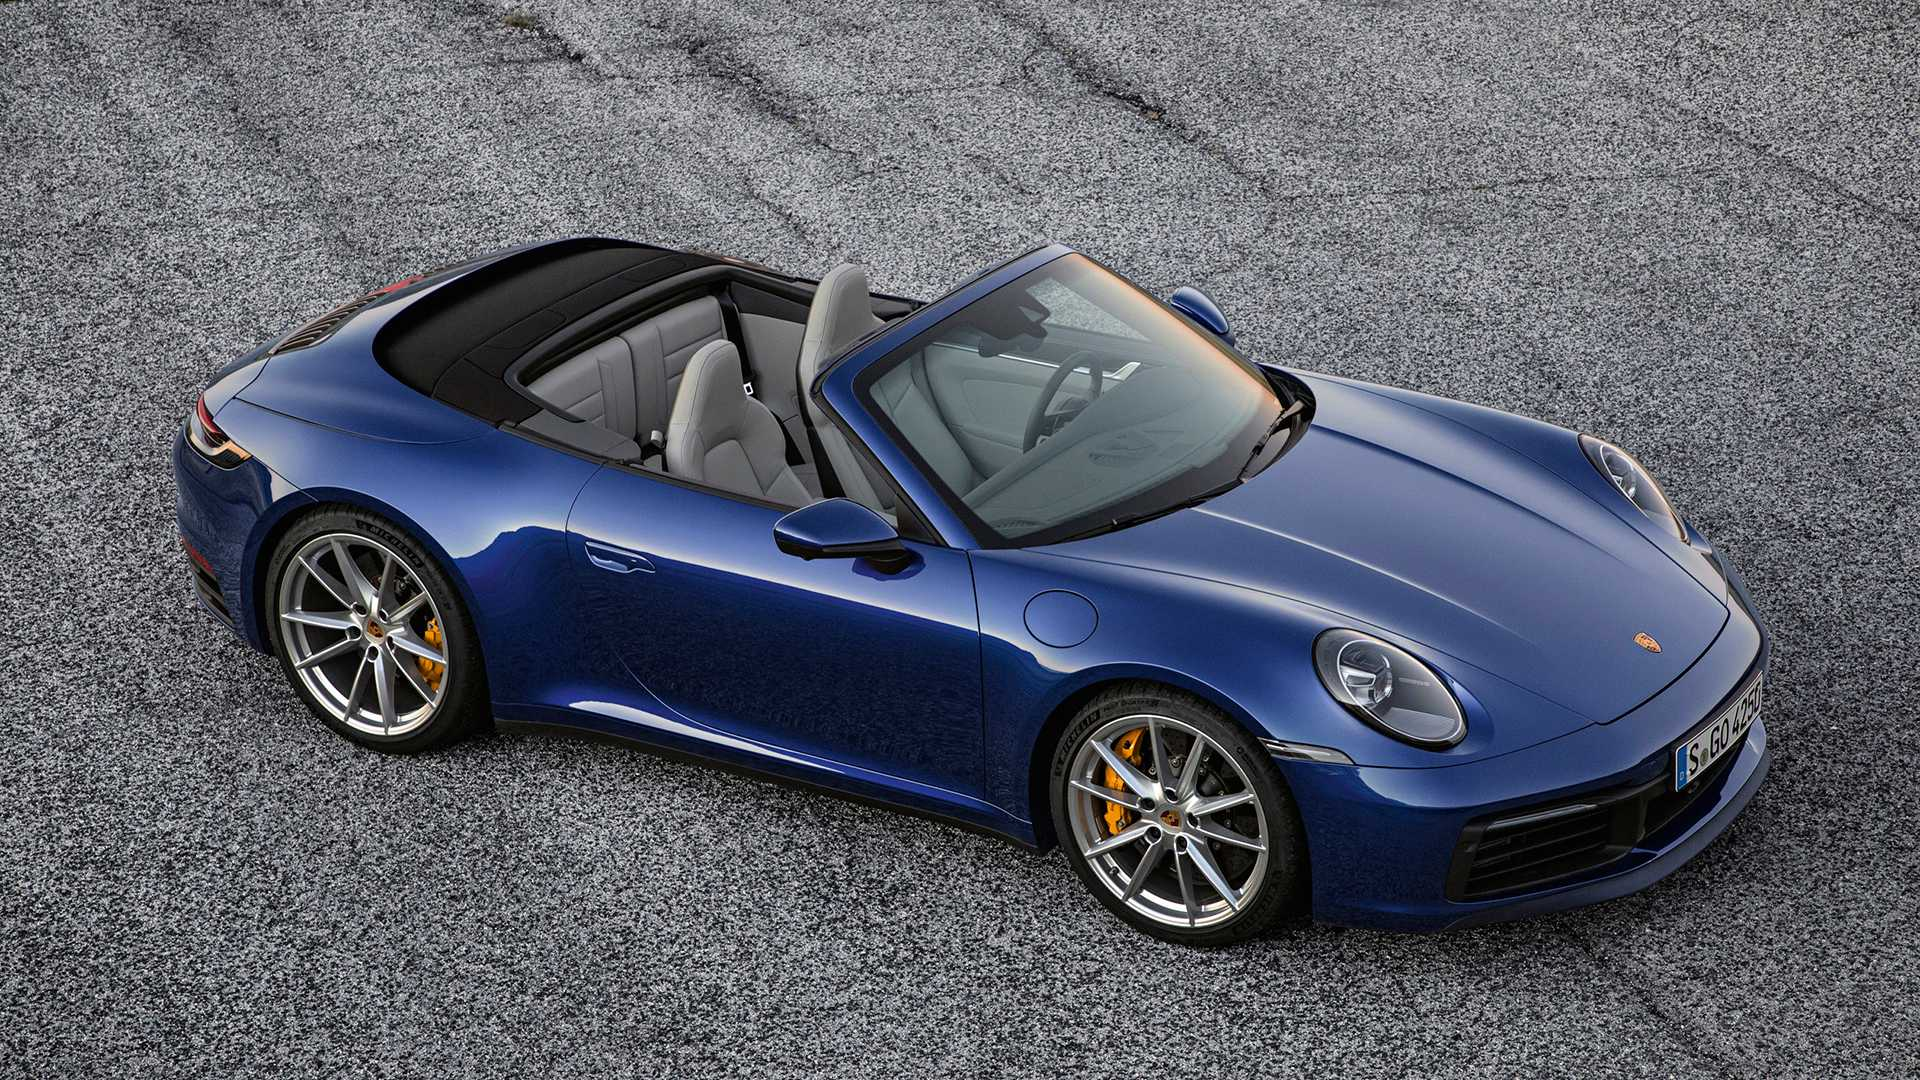 2020-porsche-911-cabriolet-trinh-lang-3.jpg